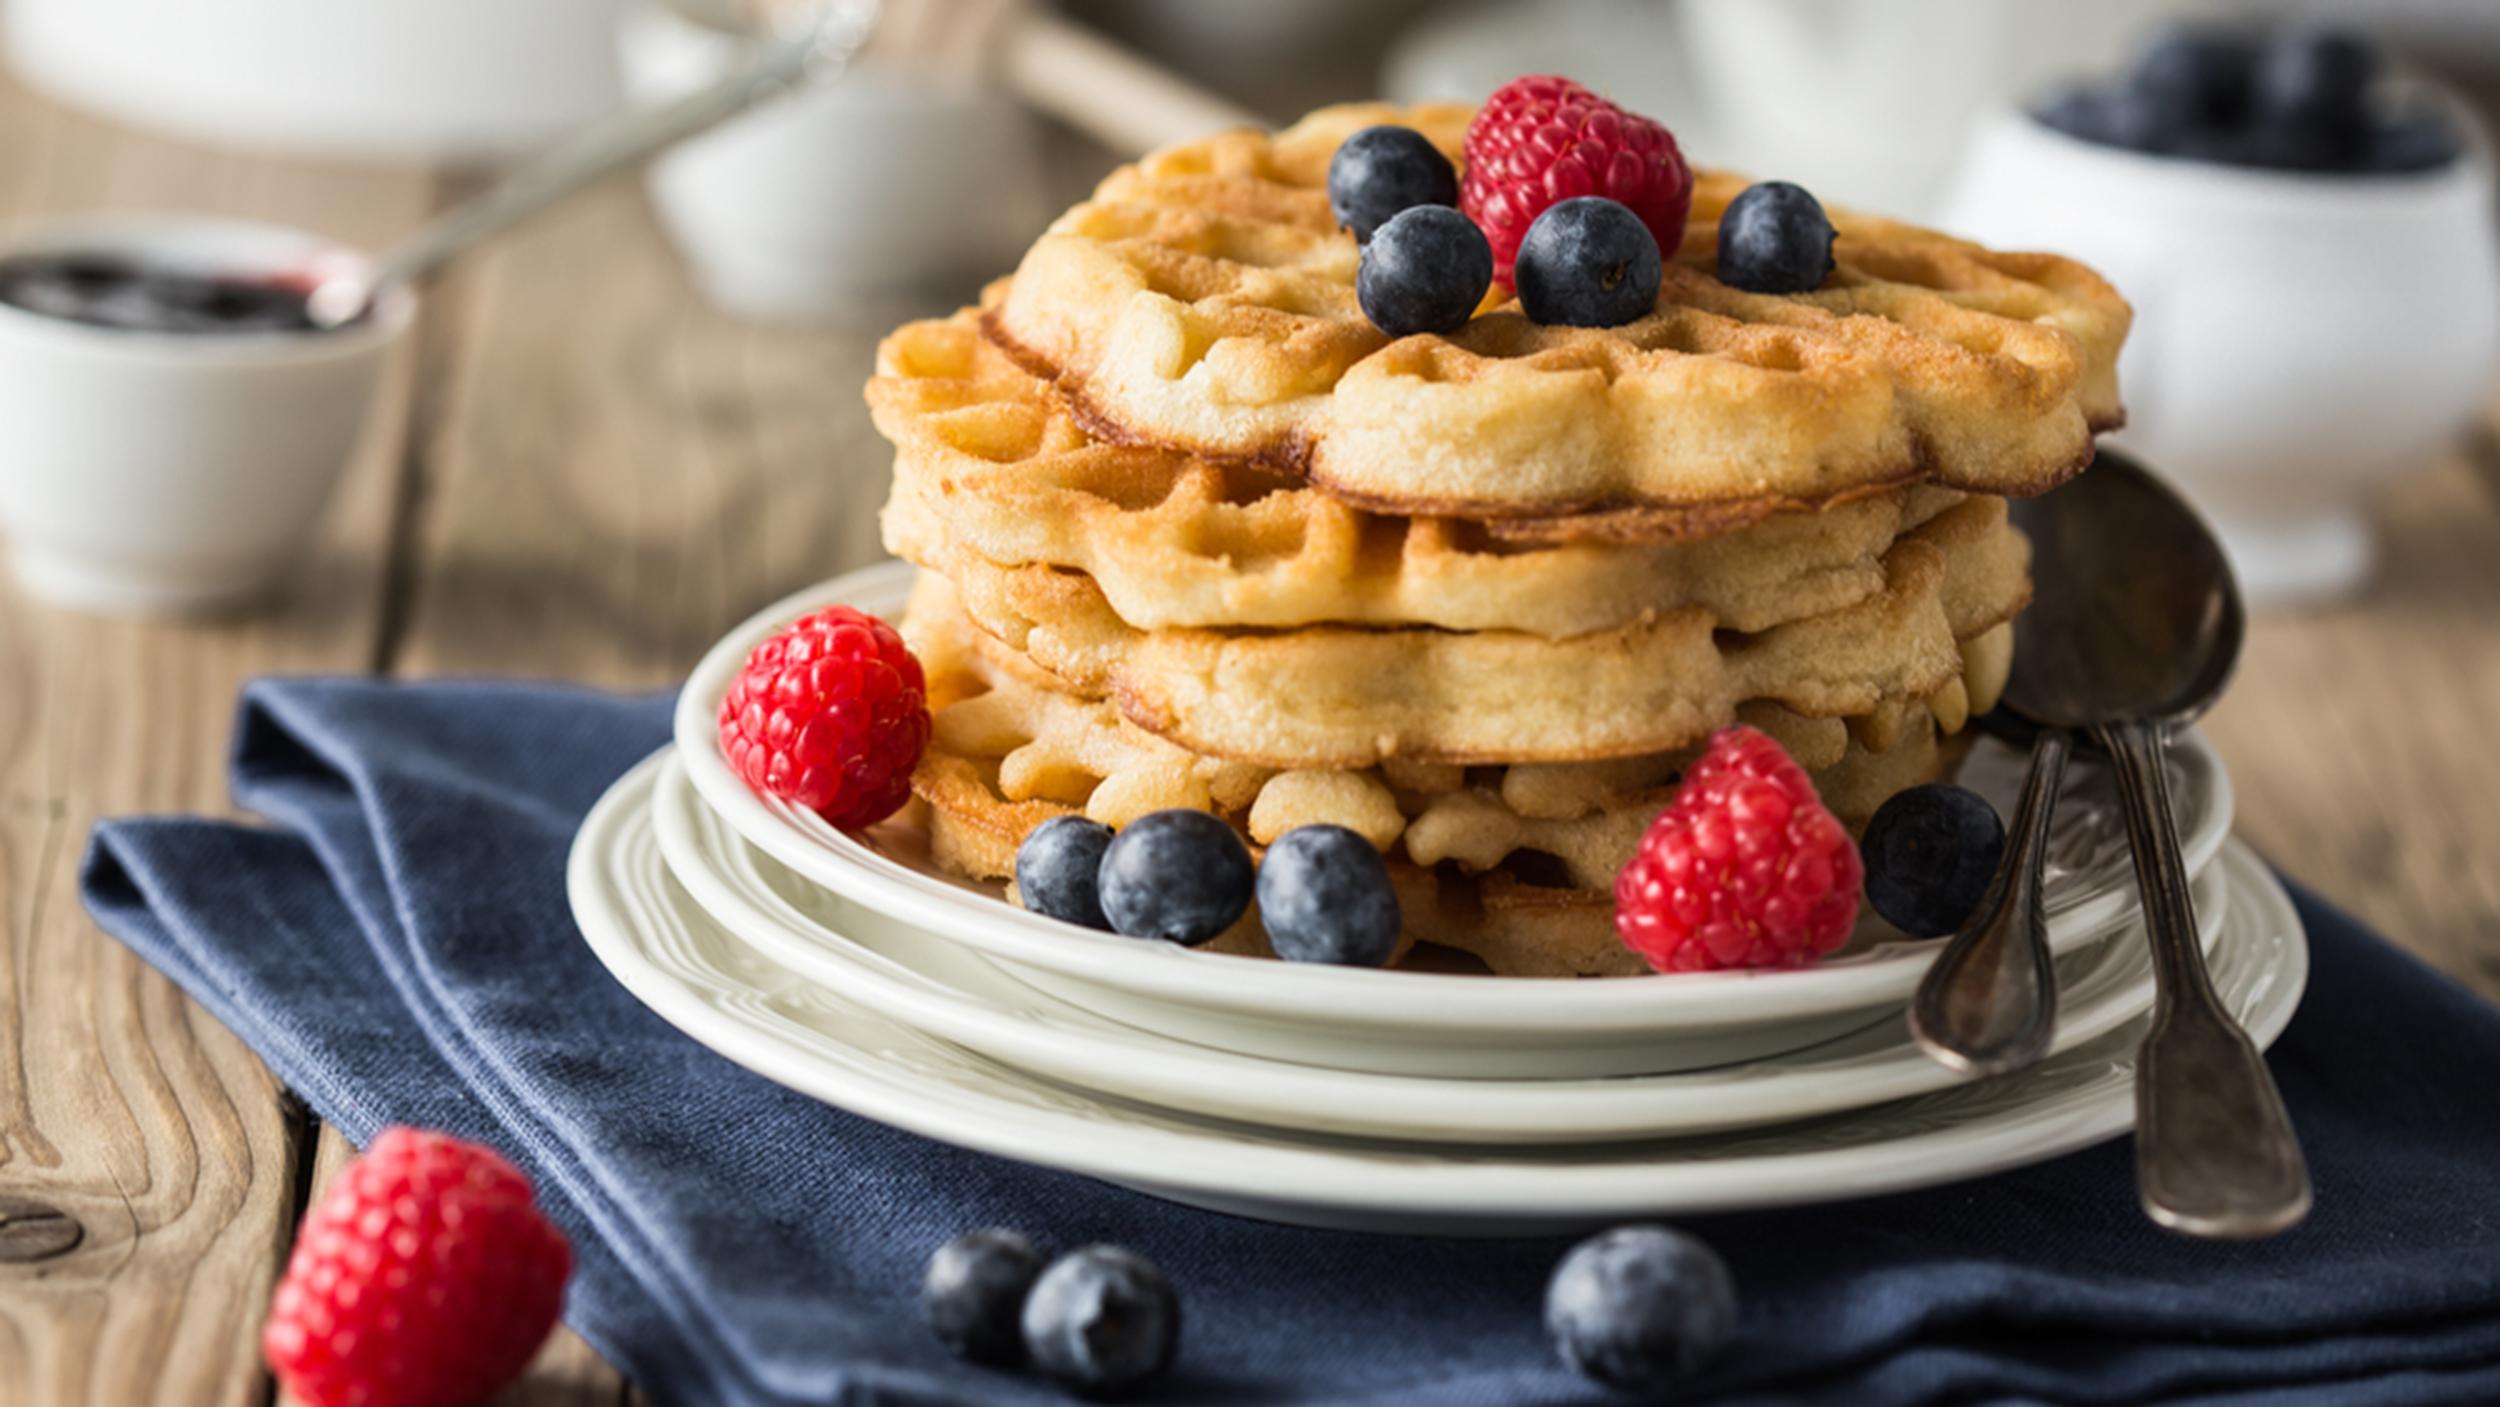 32% of pupils skip breakfast before school, study finds ...